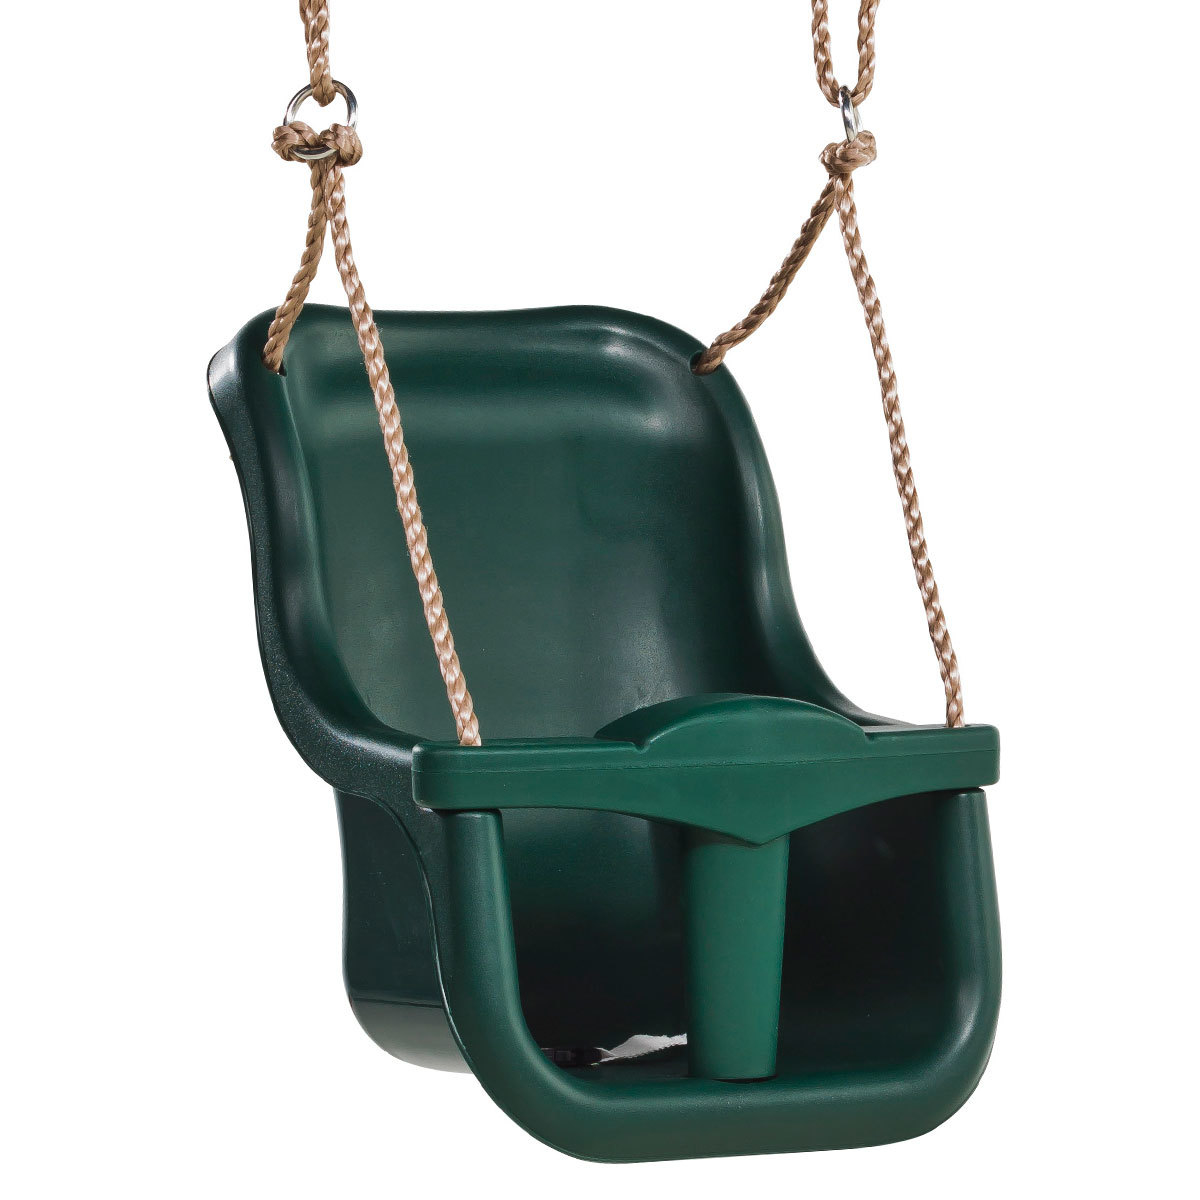 High Back Baby Swing Seat